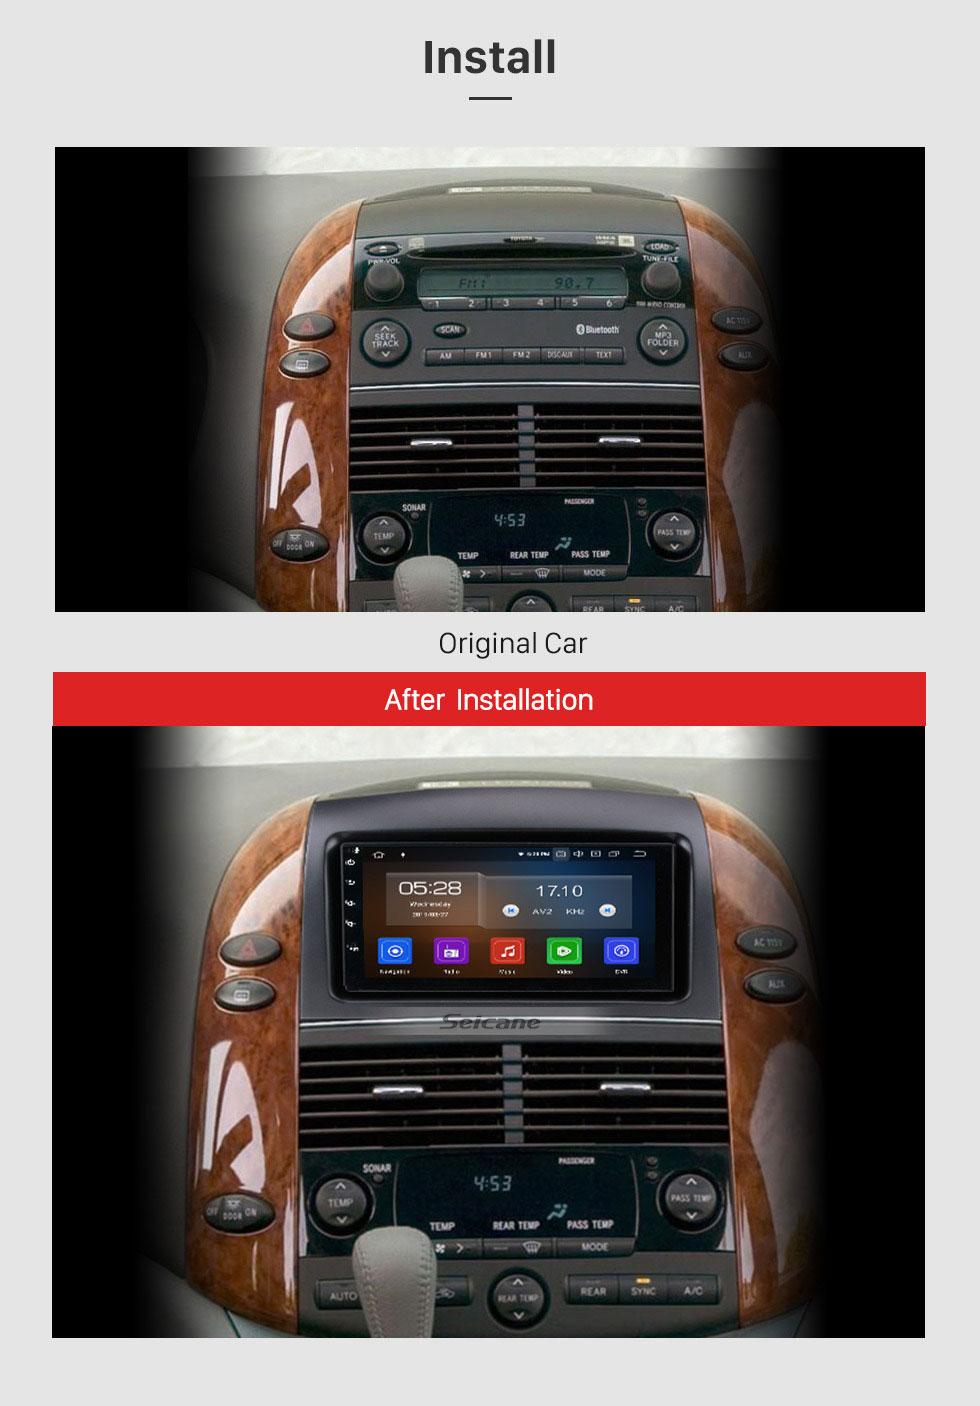 Seicane Android 9.0 2004-2010 Toyota Sienna Radio GPS Navigationssystem Mit HD Touchscreen Bluetooth 3G Wlan Rückfahrkamera Lenkradsteuerung